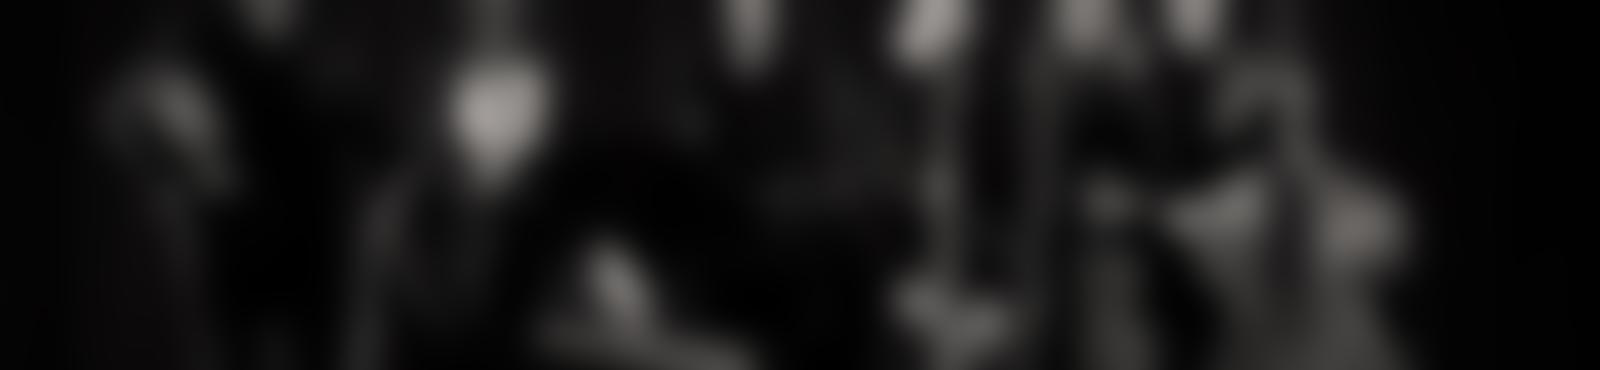 Blurred 00c239ac c518 442b ae4a ddebe9a60286